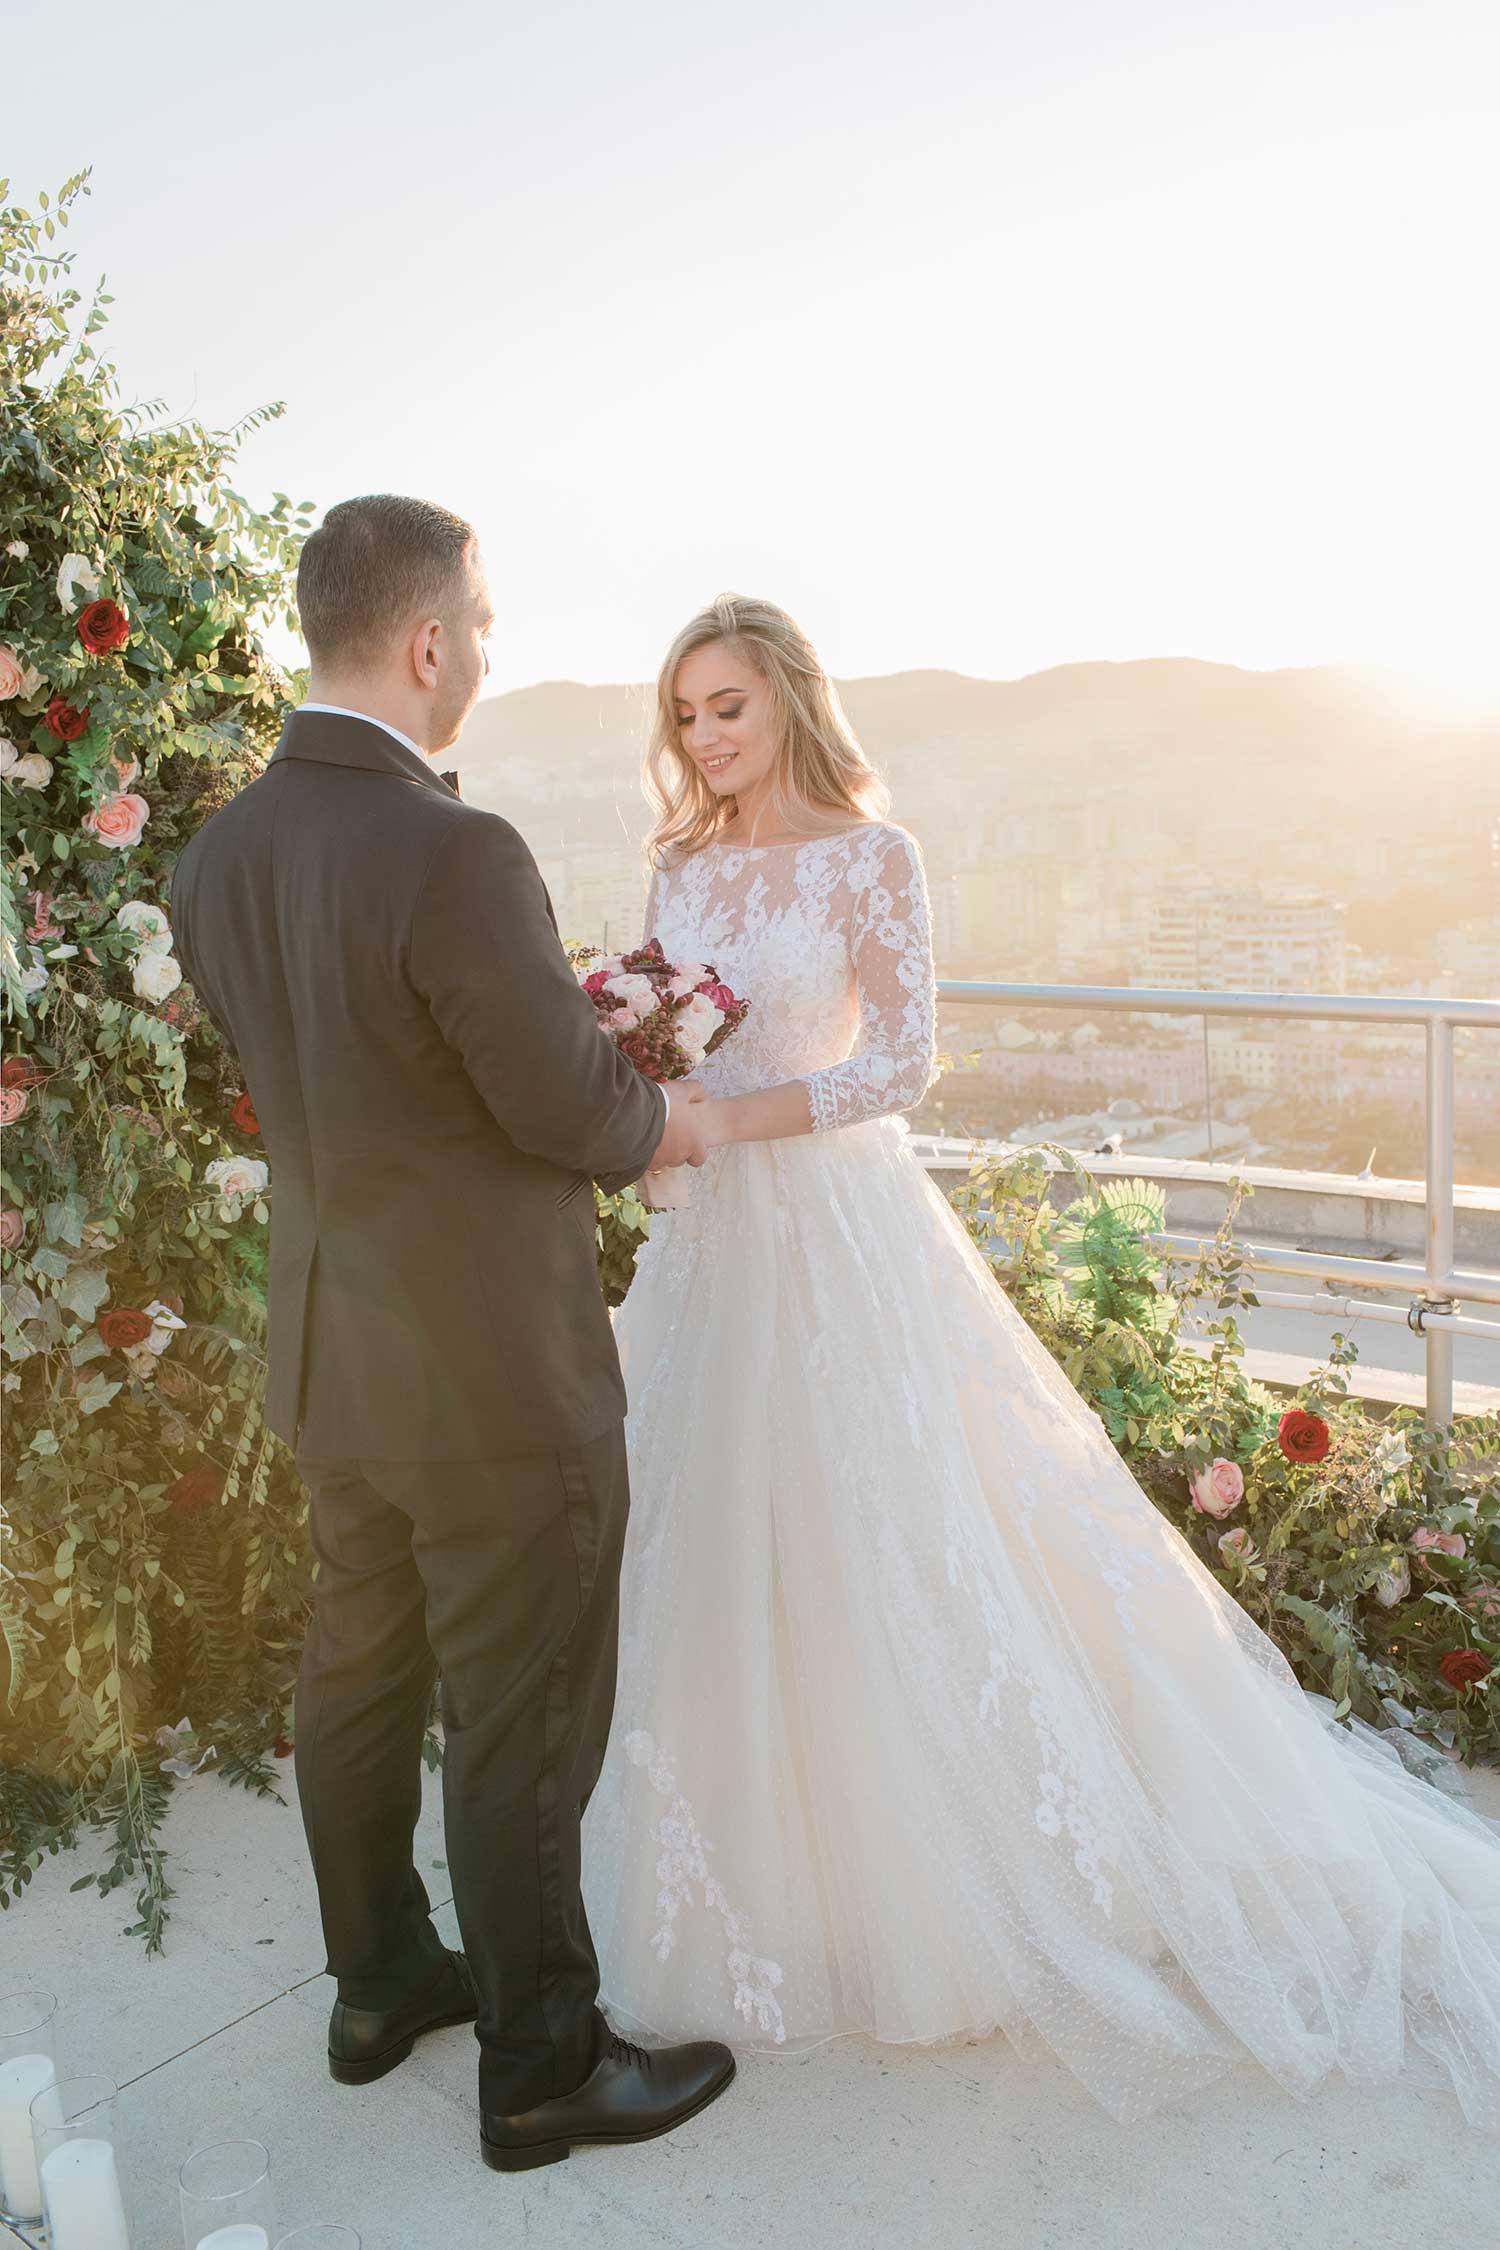 Pre-wedding photoshoot on terrace